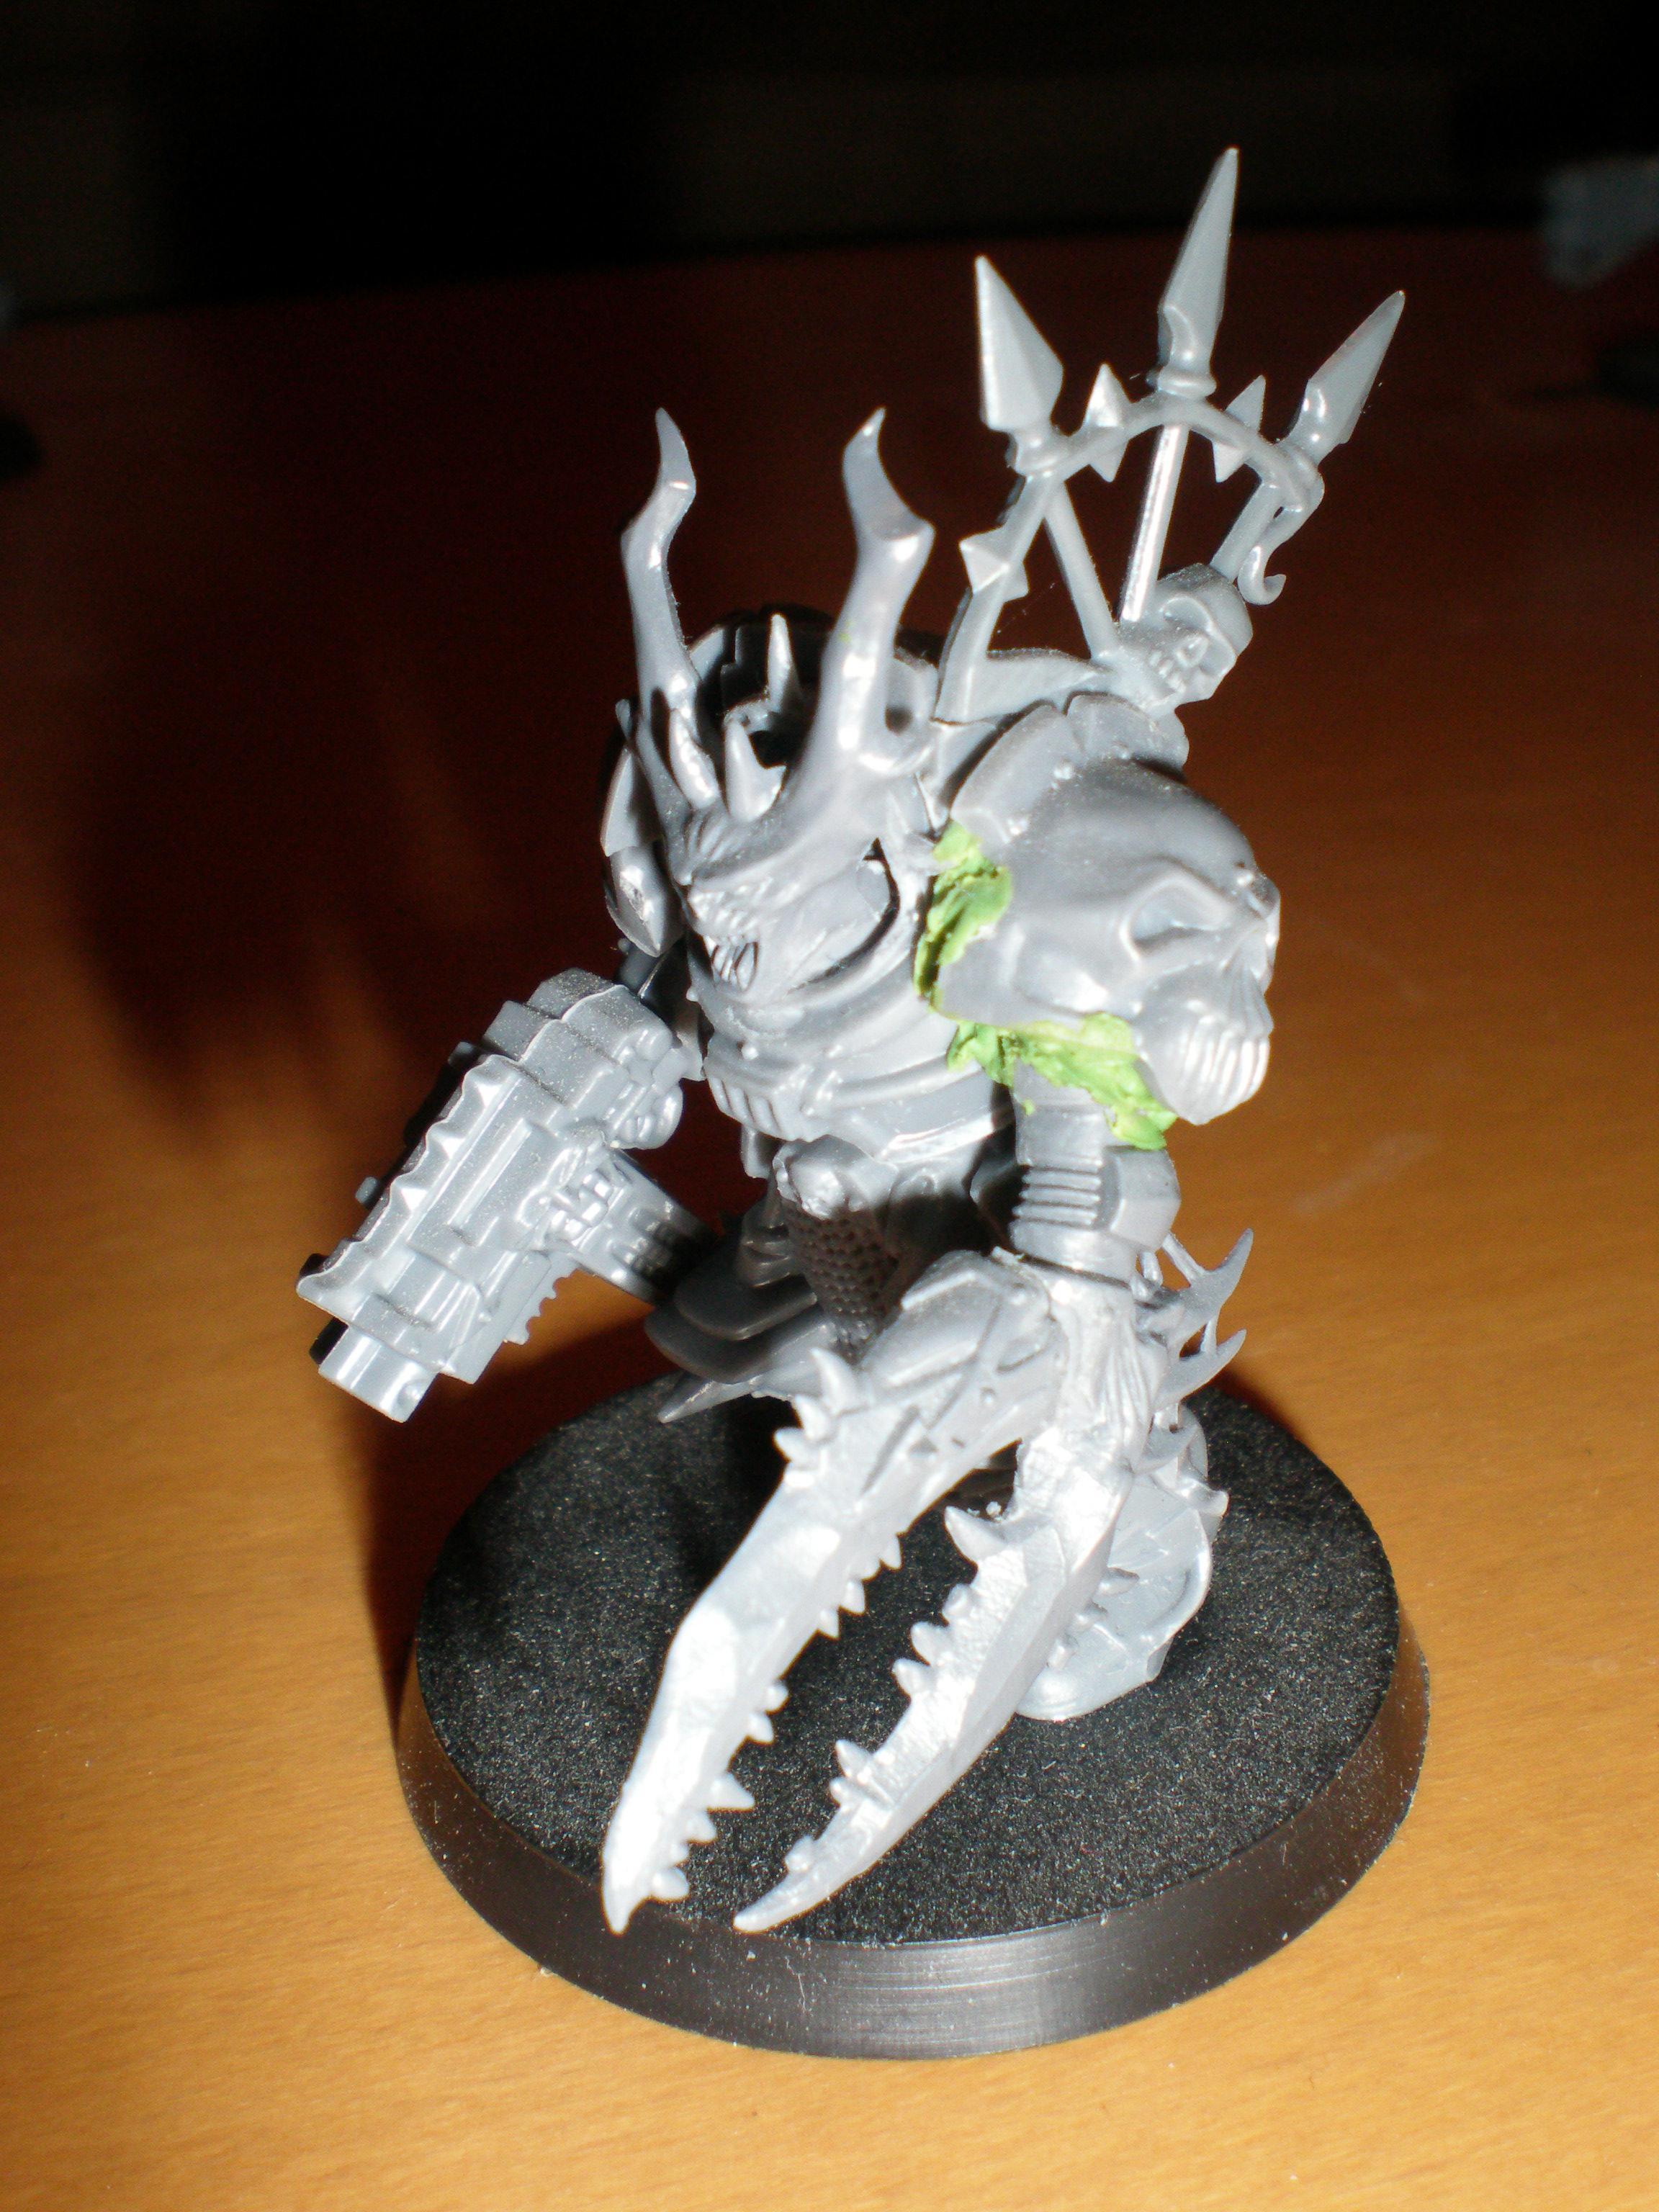 Chaos, Kit Bash, Warhammer 40,000